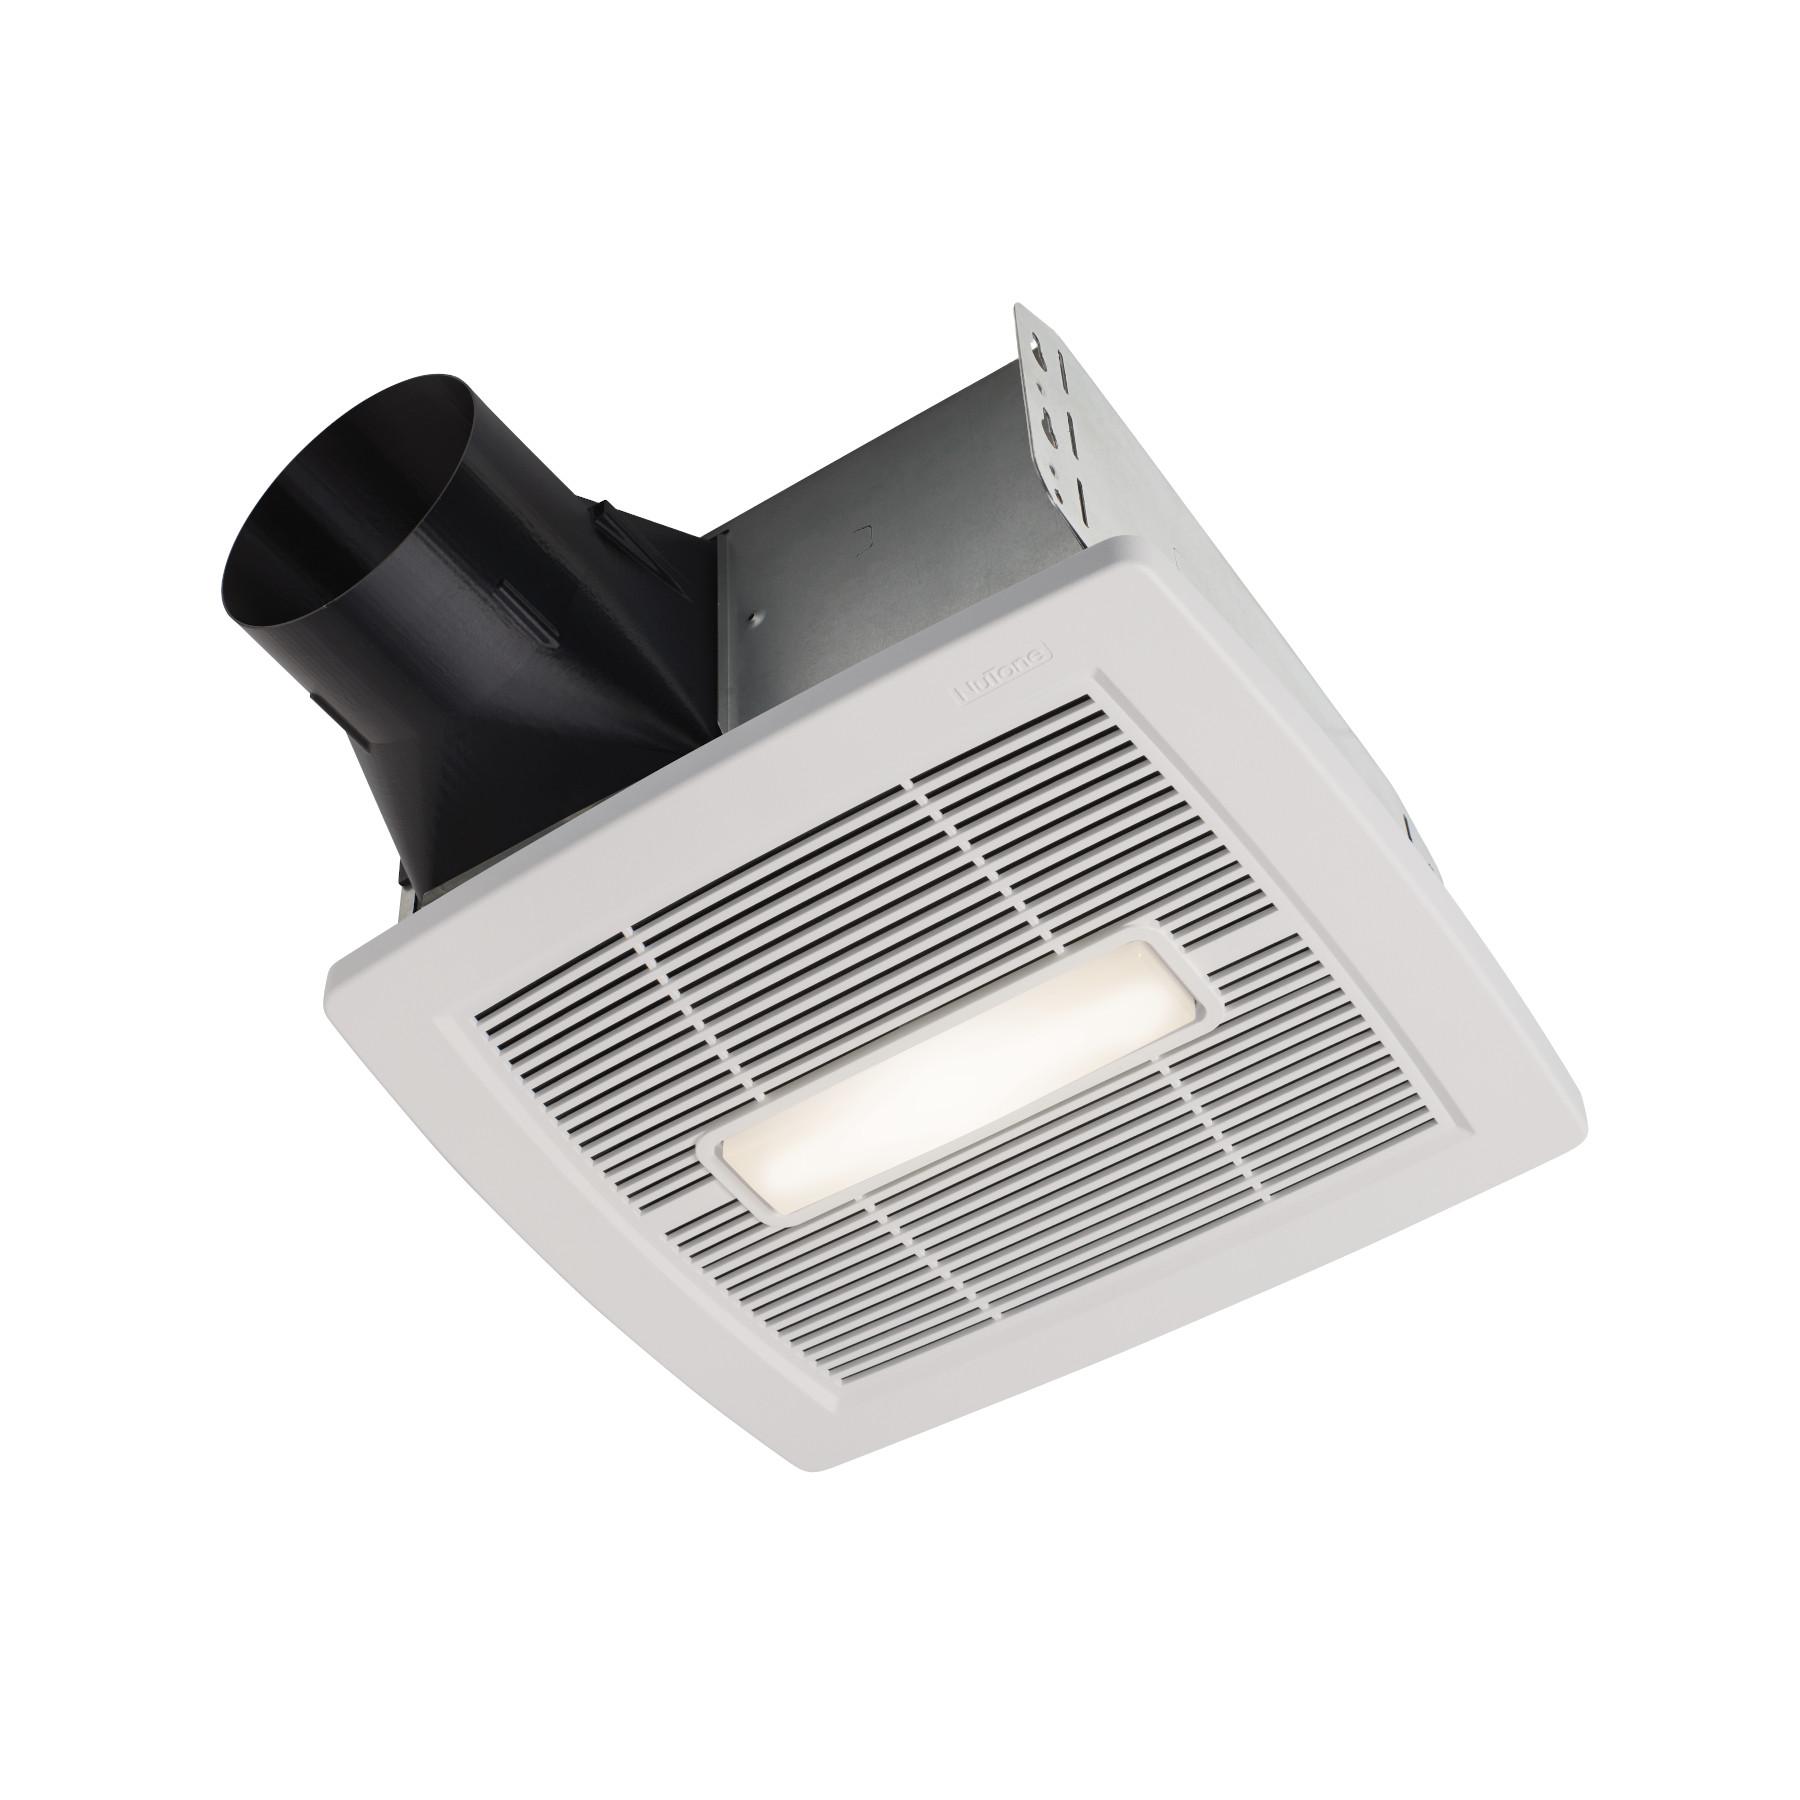 Humidity Sensing Bathroom Exhaust Fan W